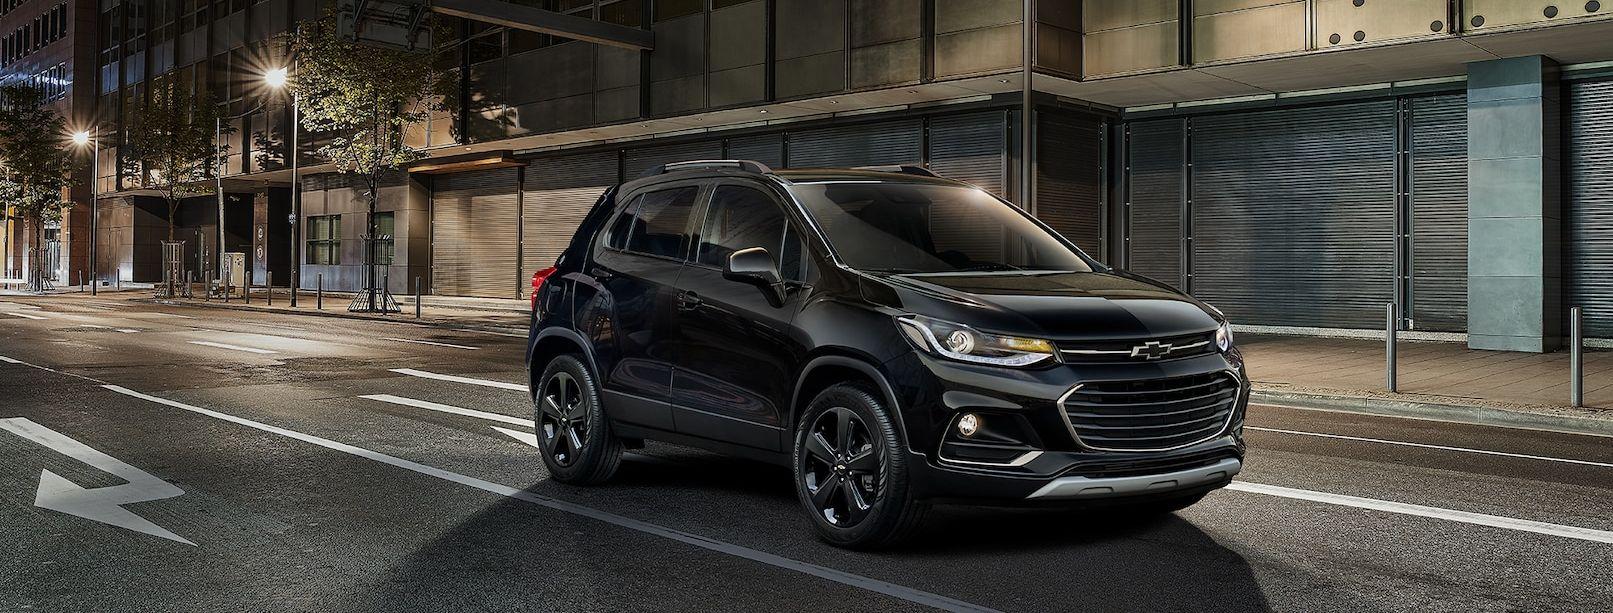 2019 Chevrolet Trax for Sale near Ann Arbor, MI